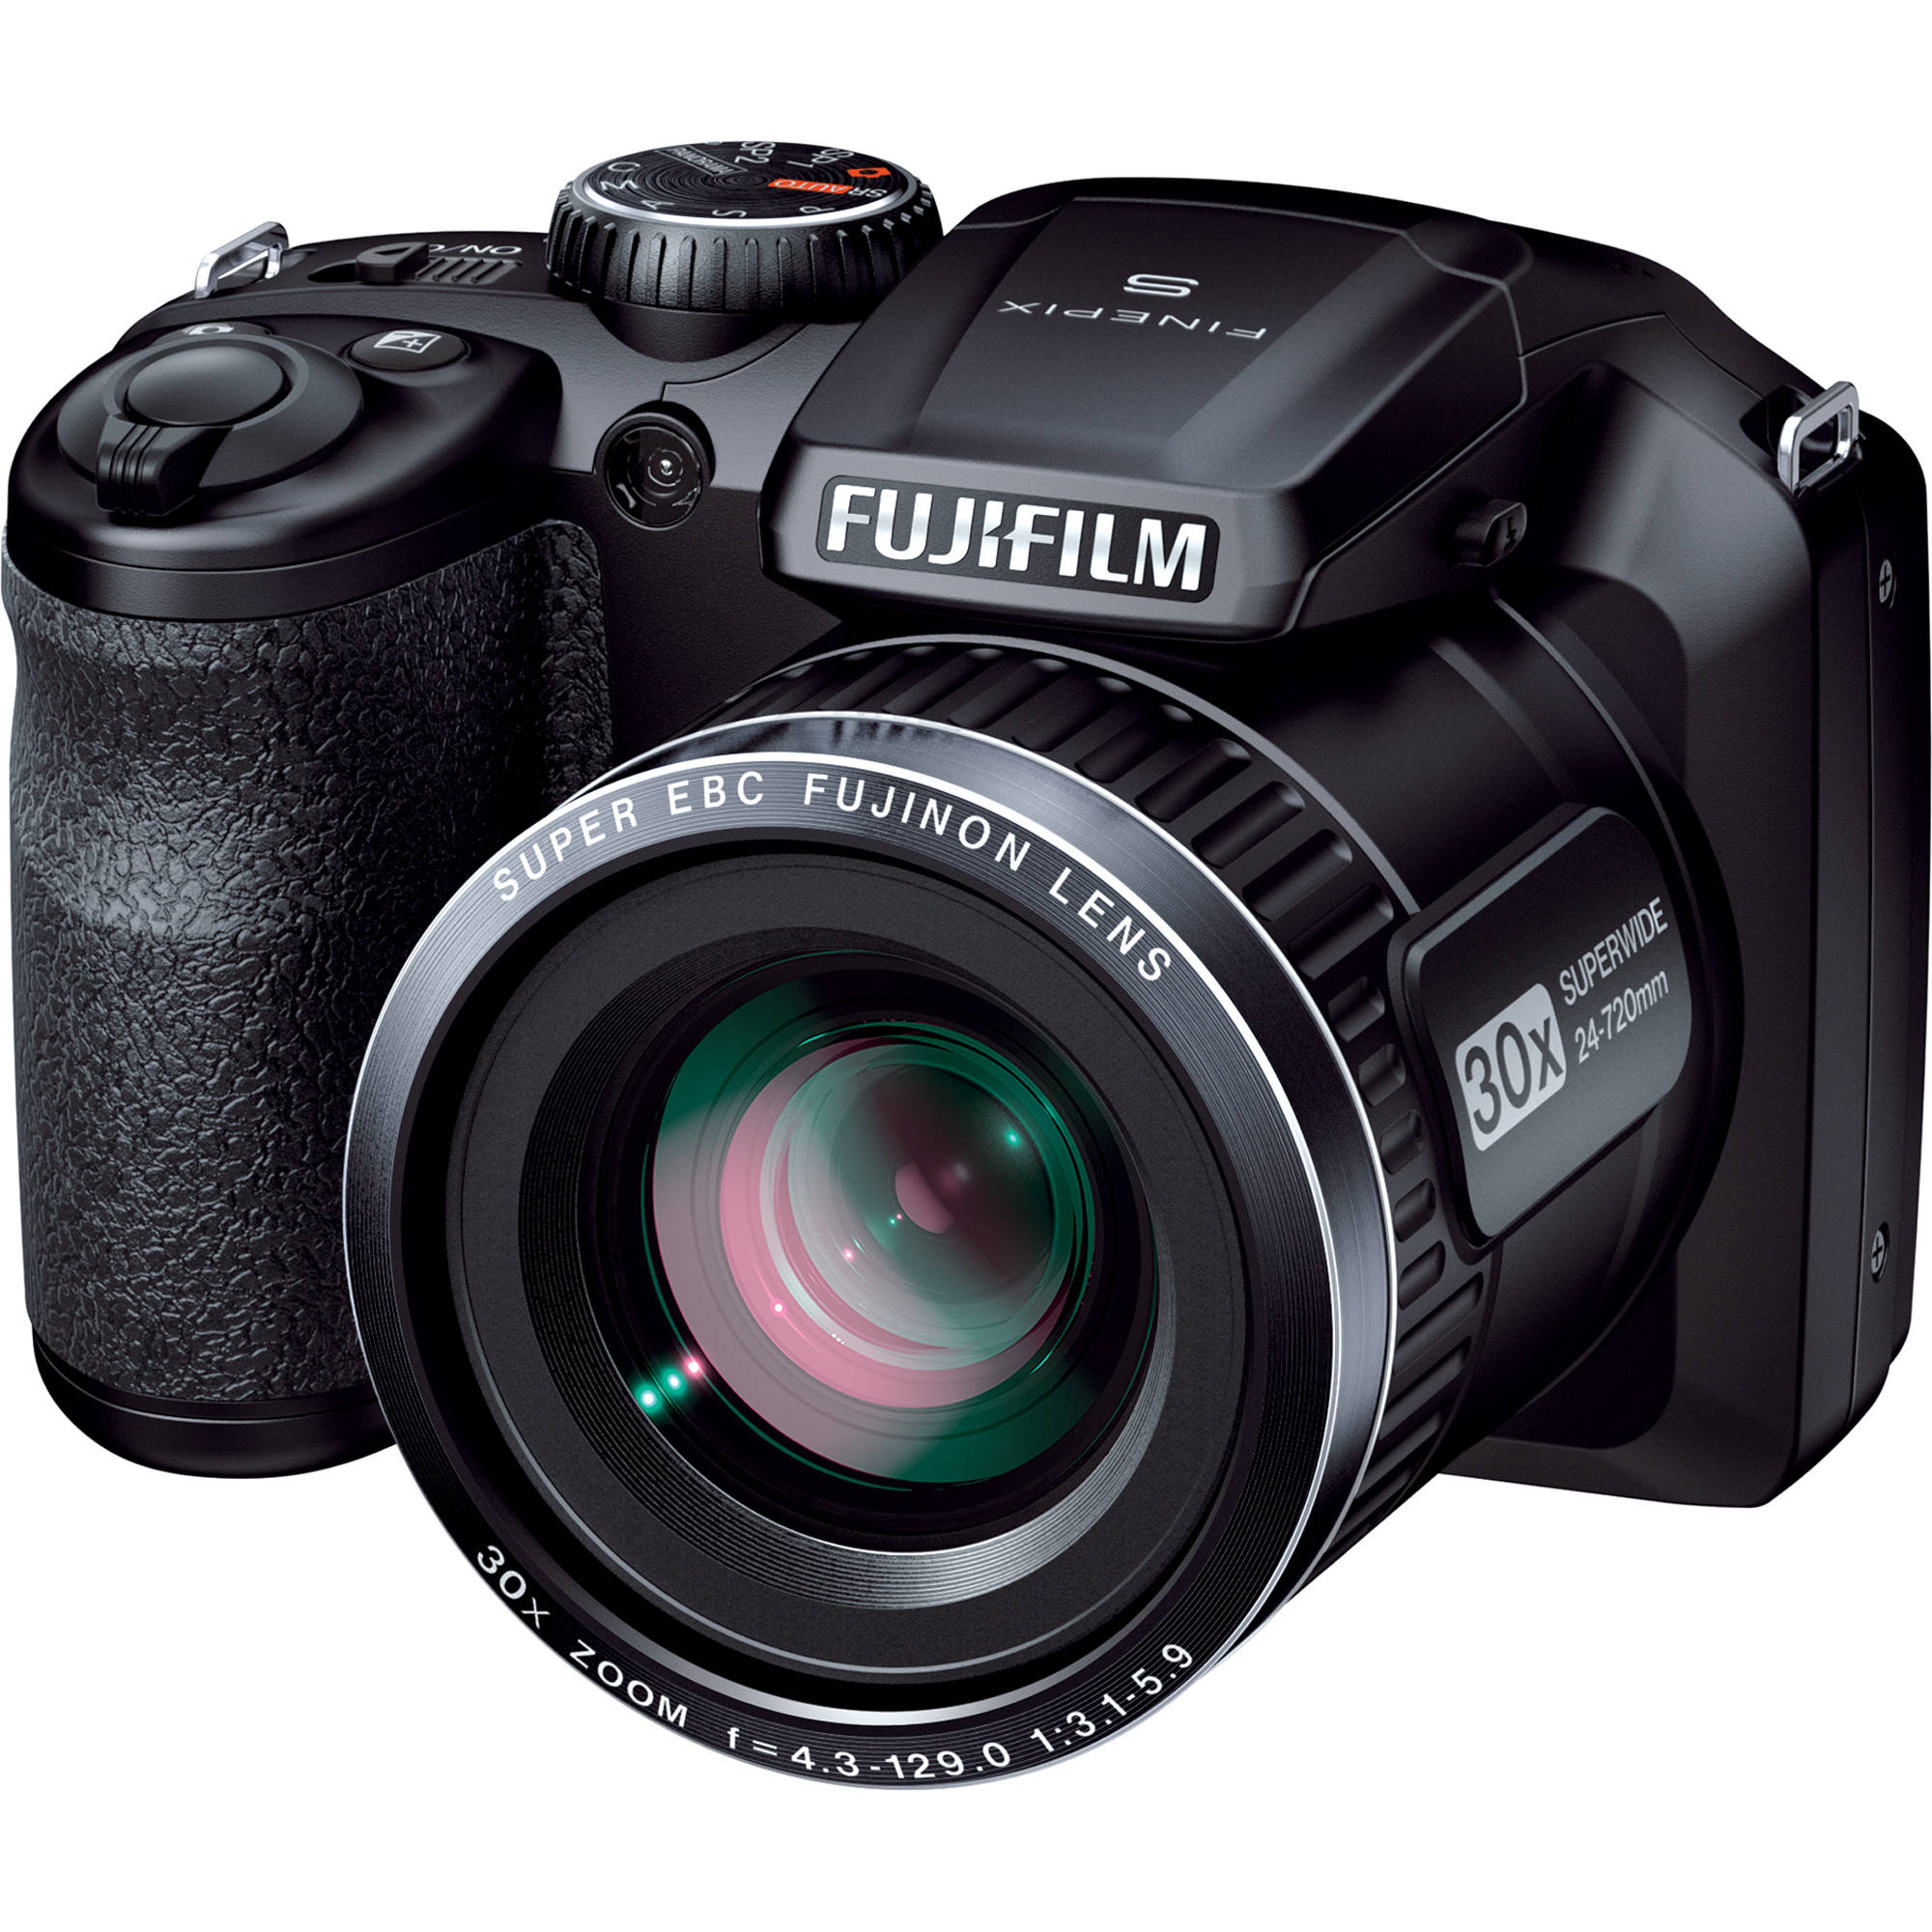 Fujifilm FinePix S4800 Digital Camera 16301535 BampH Photo Video